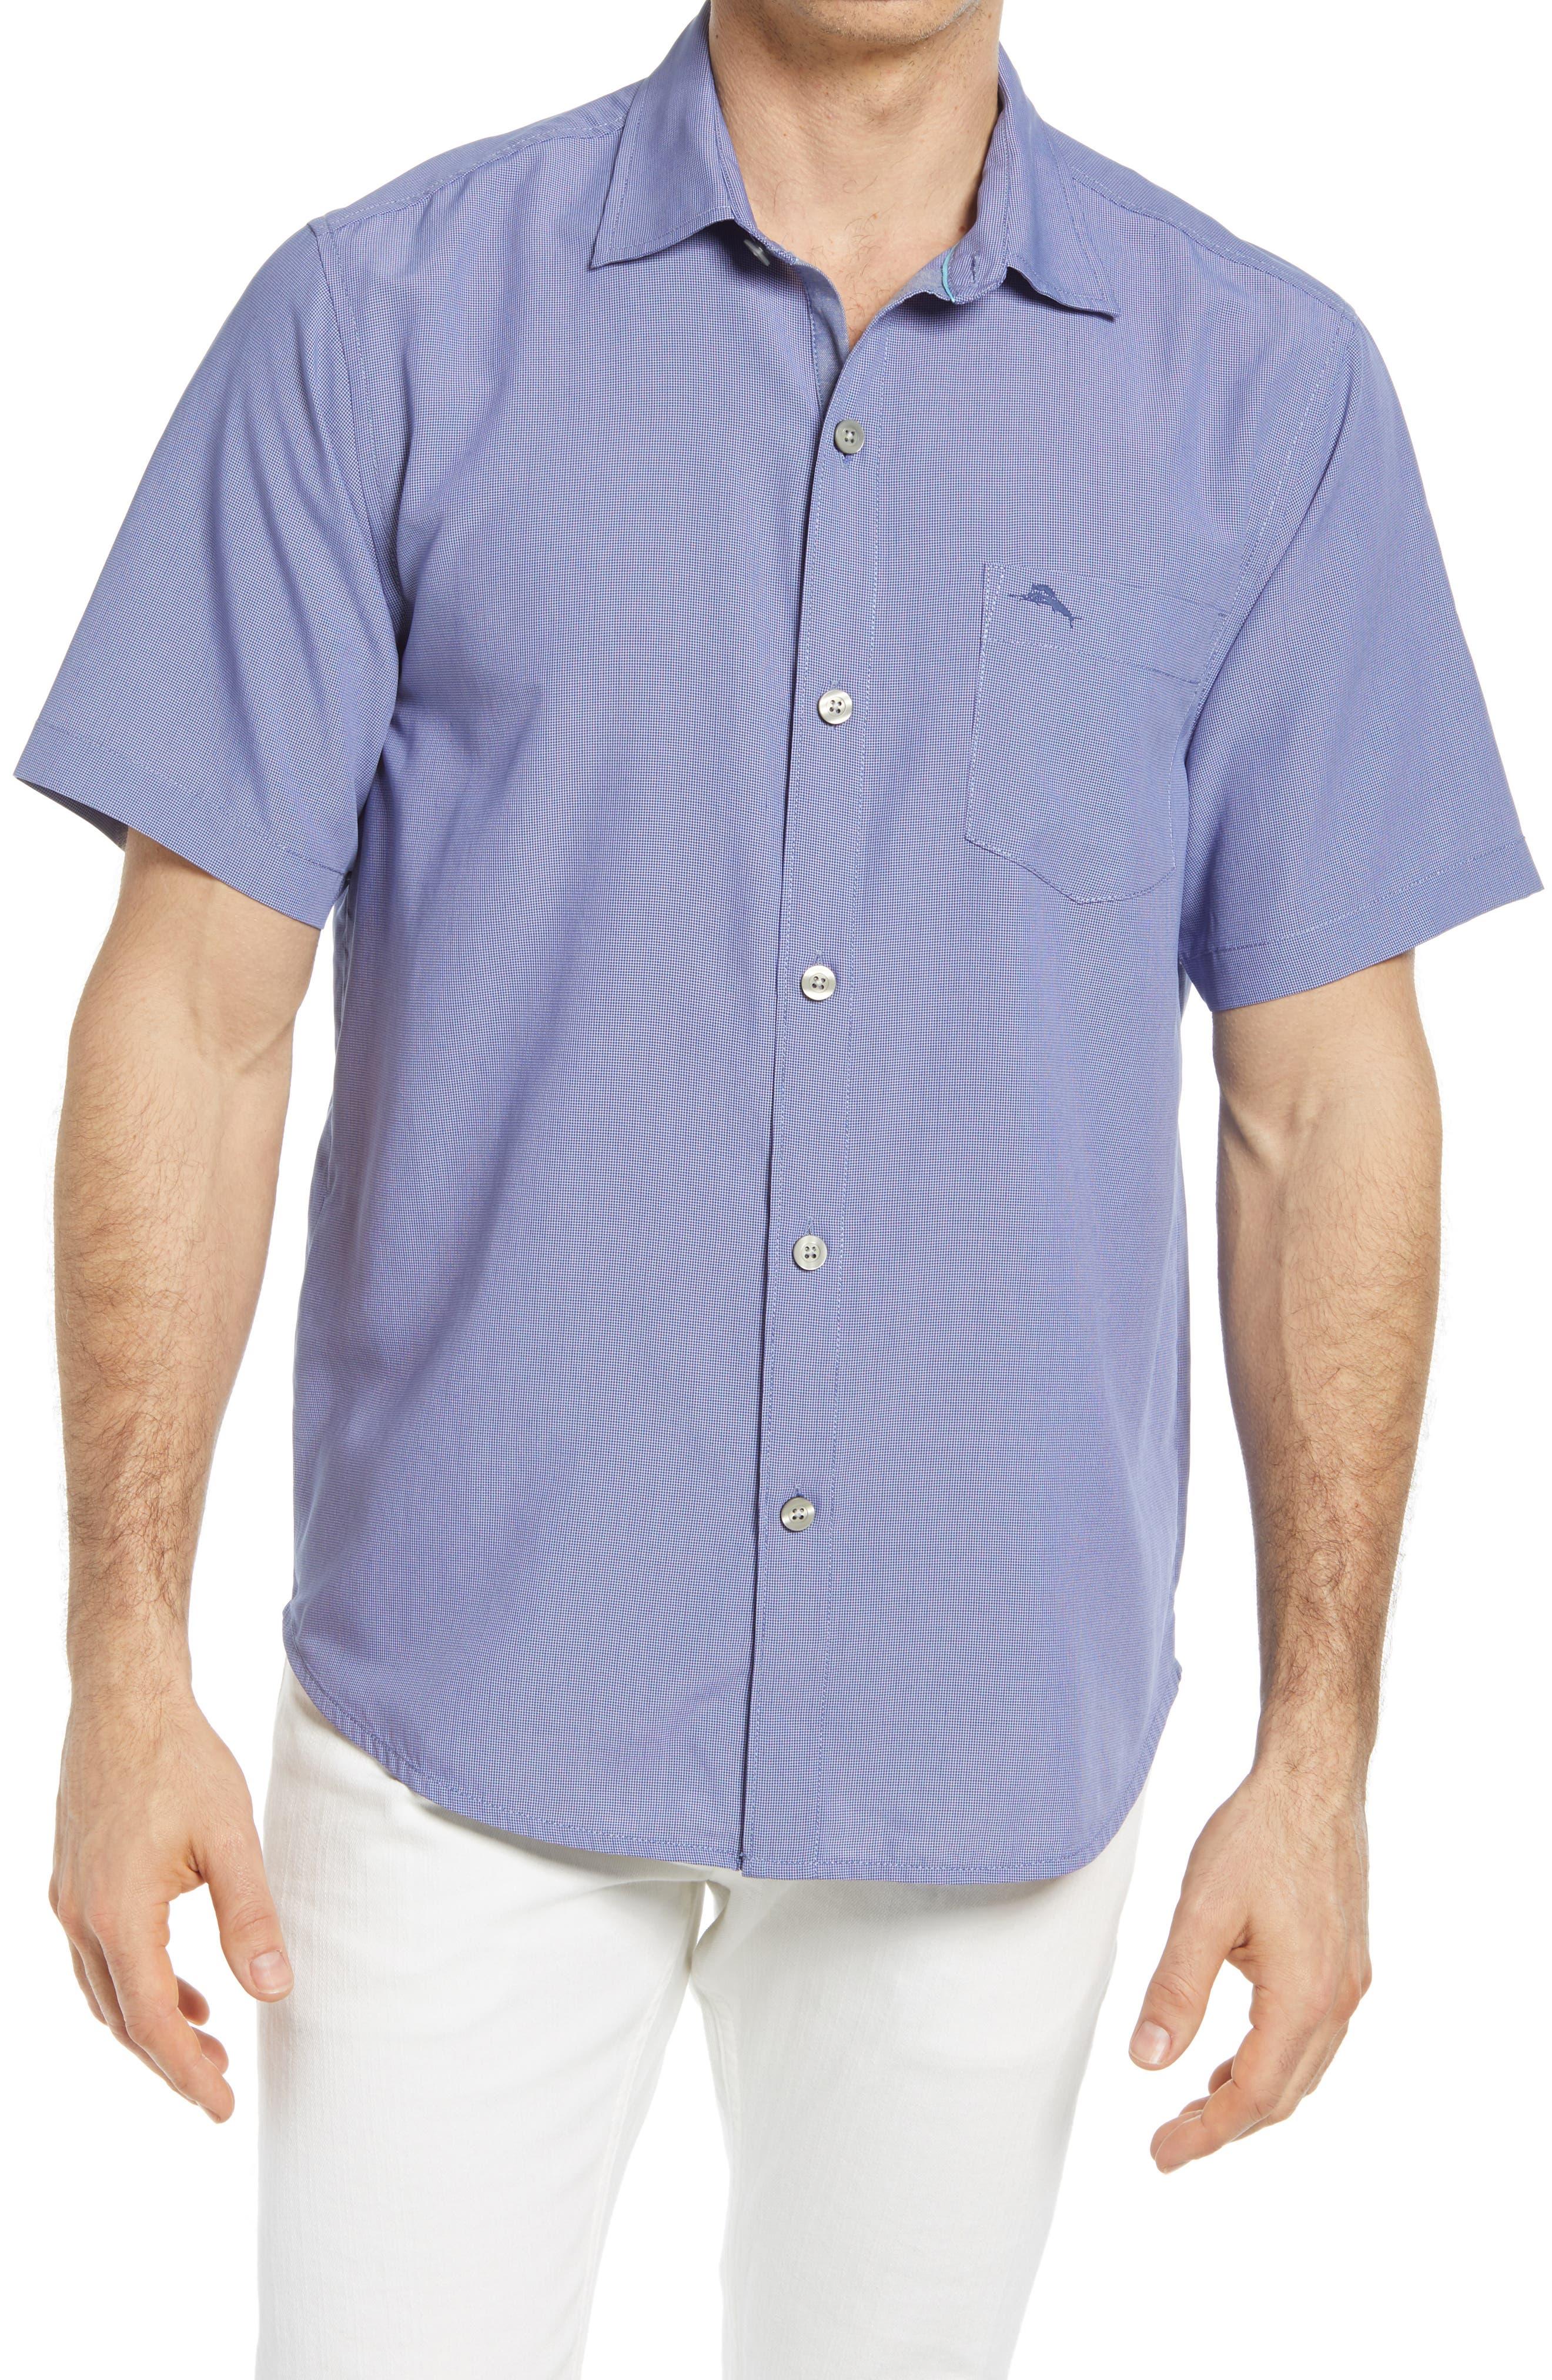 FRAME Mens Long Sleeve Tile Plaid Button Down Shirt Ivory Blue Size Medium